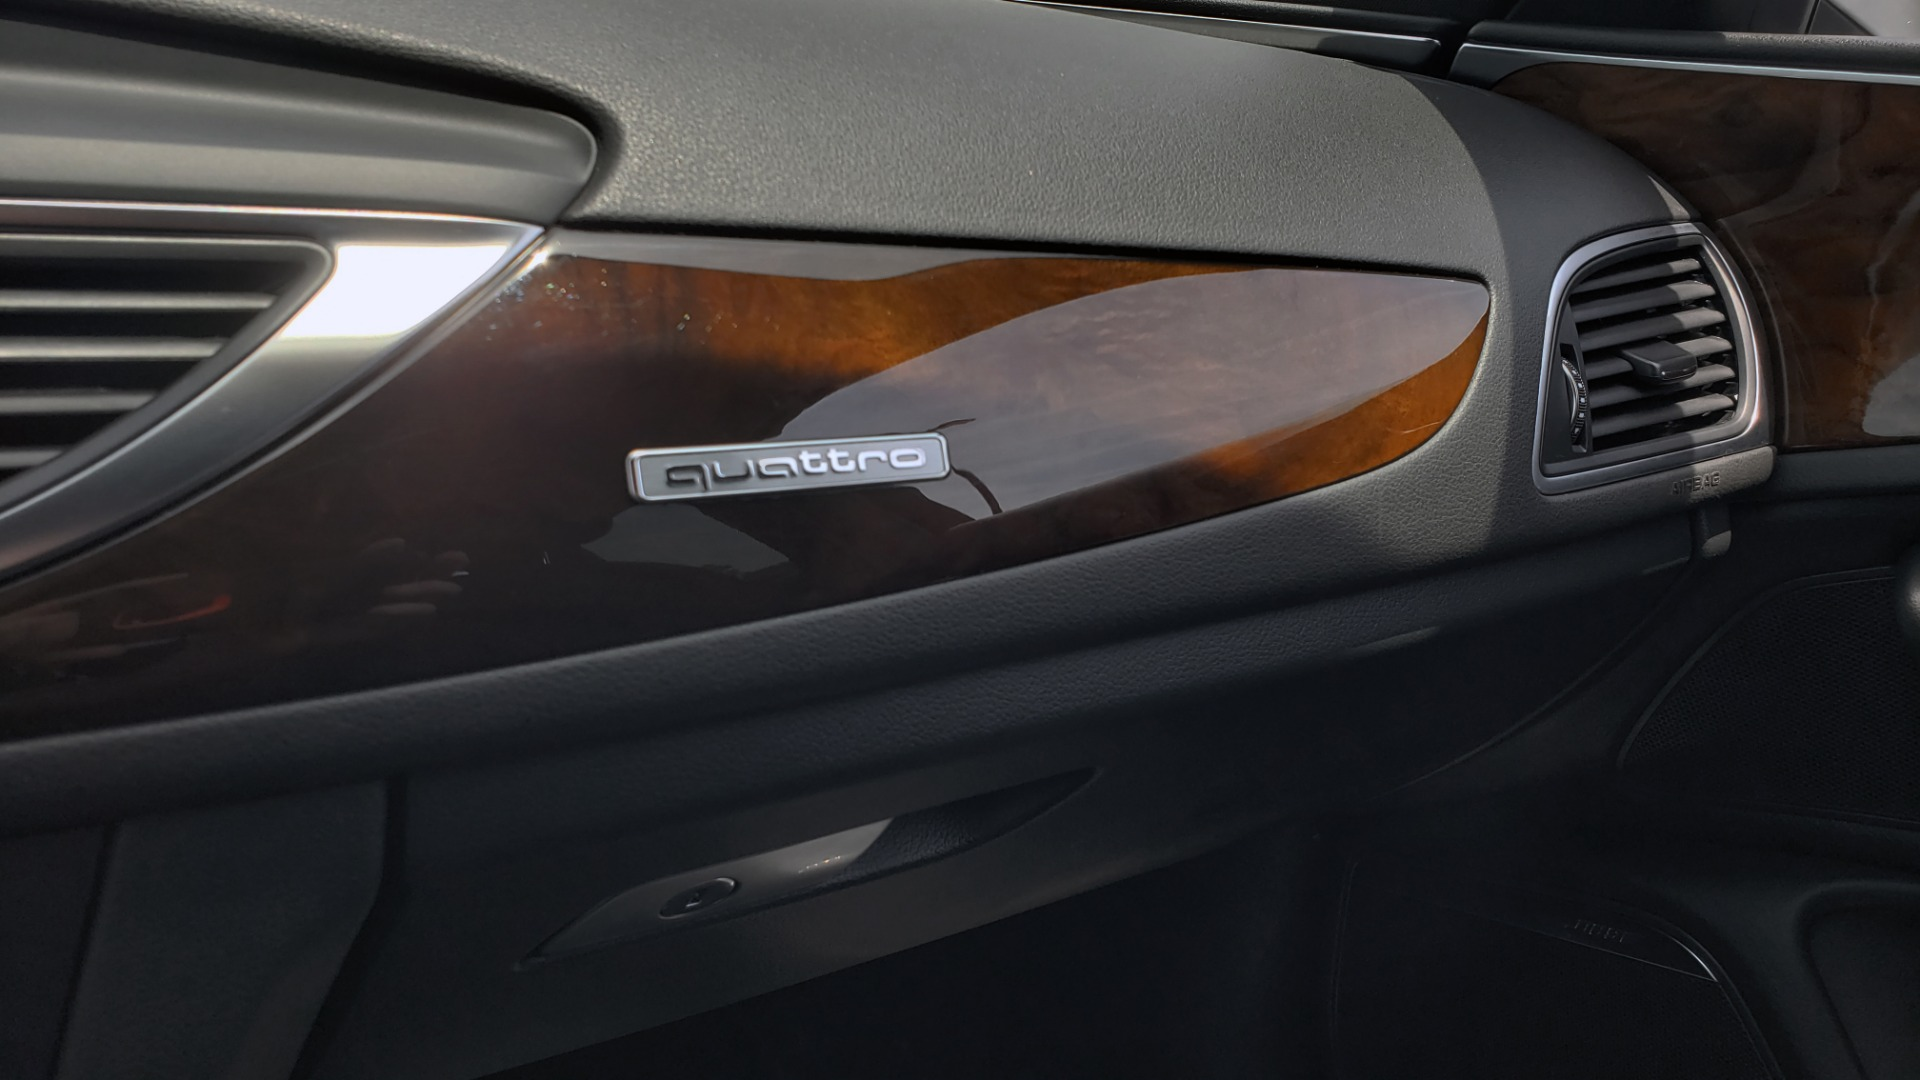 Used 2017 Audi A6 PRESTIGE SEDAN 3.0T / NAV / SUNROOF / BLACK OPTIC / CLD WTHR / REARVIEW for sale $30,797 at Formula Imports in Charlotte NC 28227 53